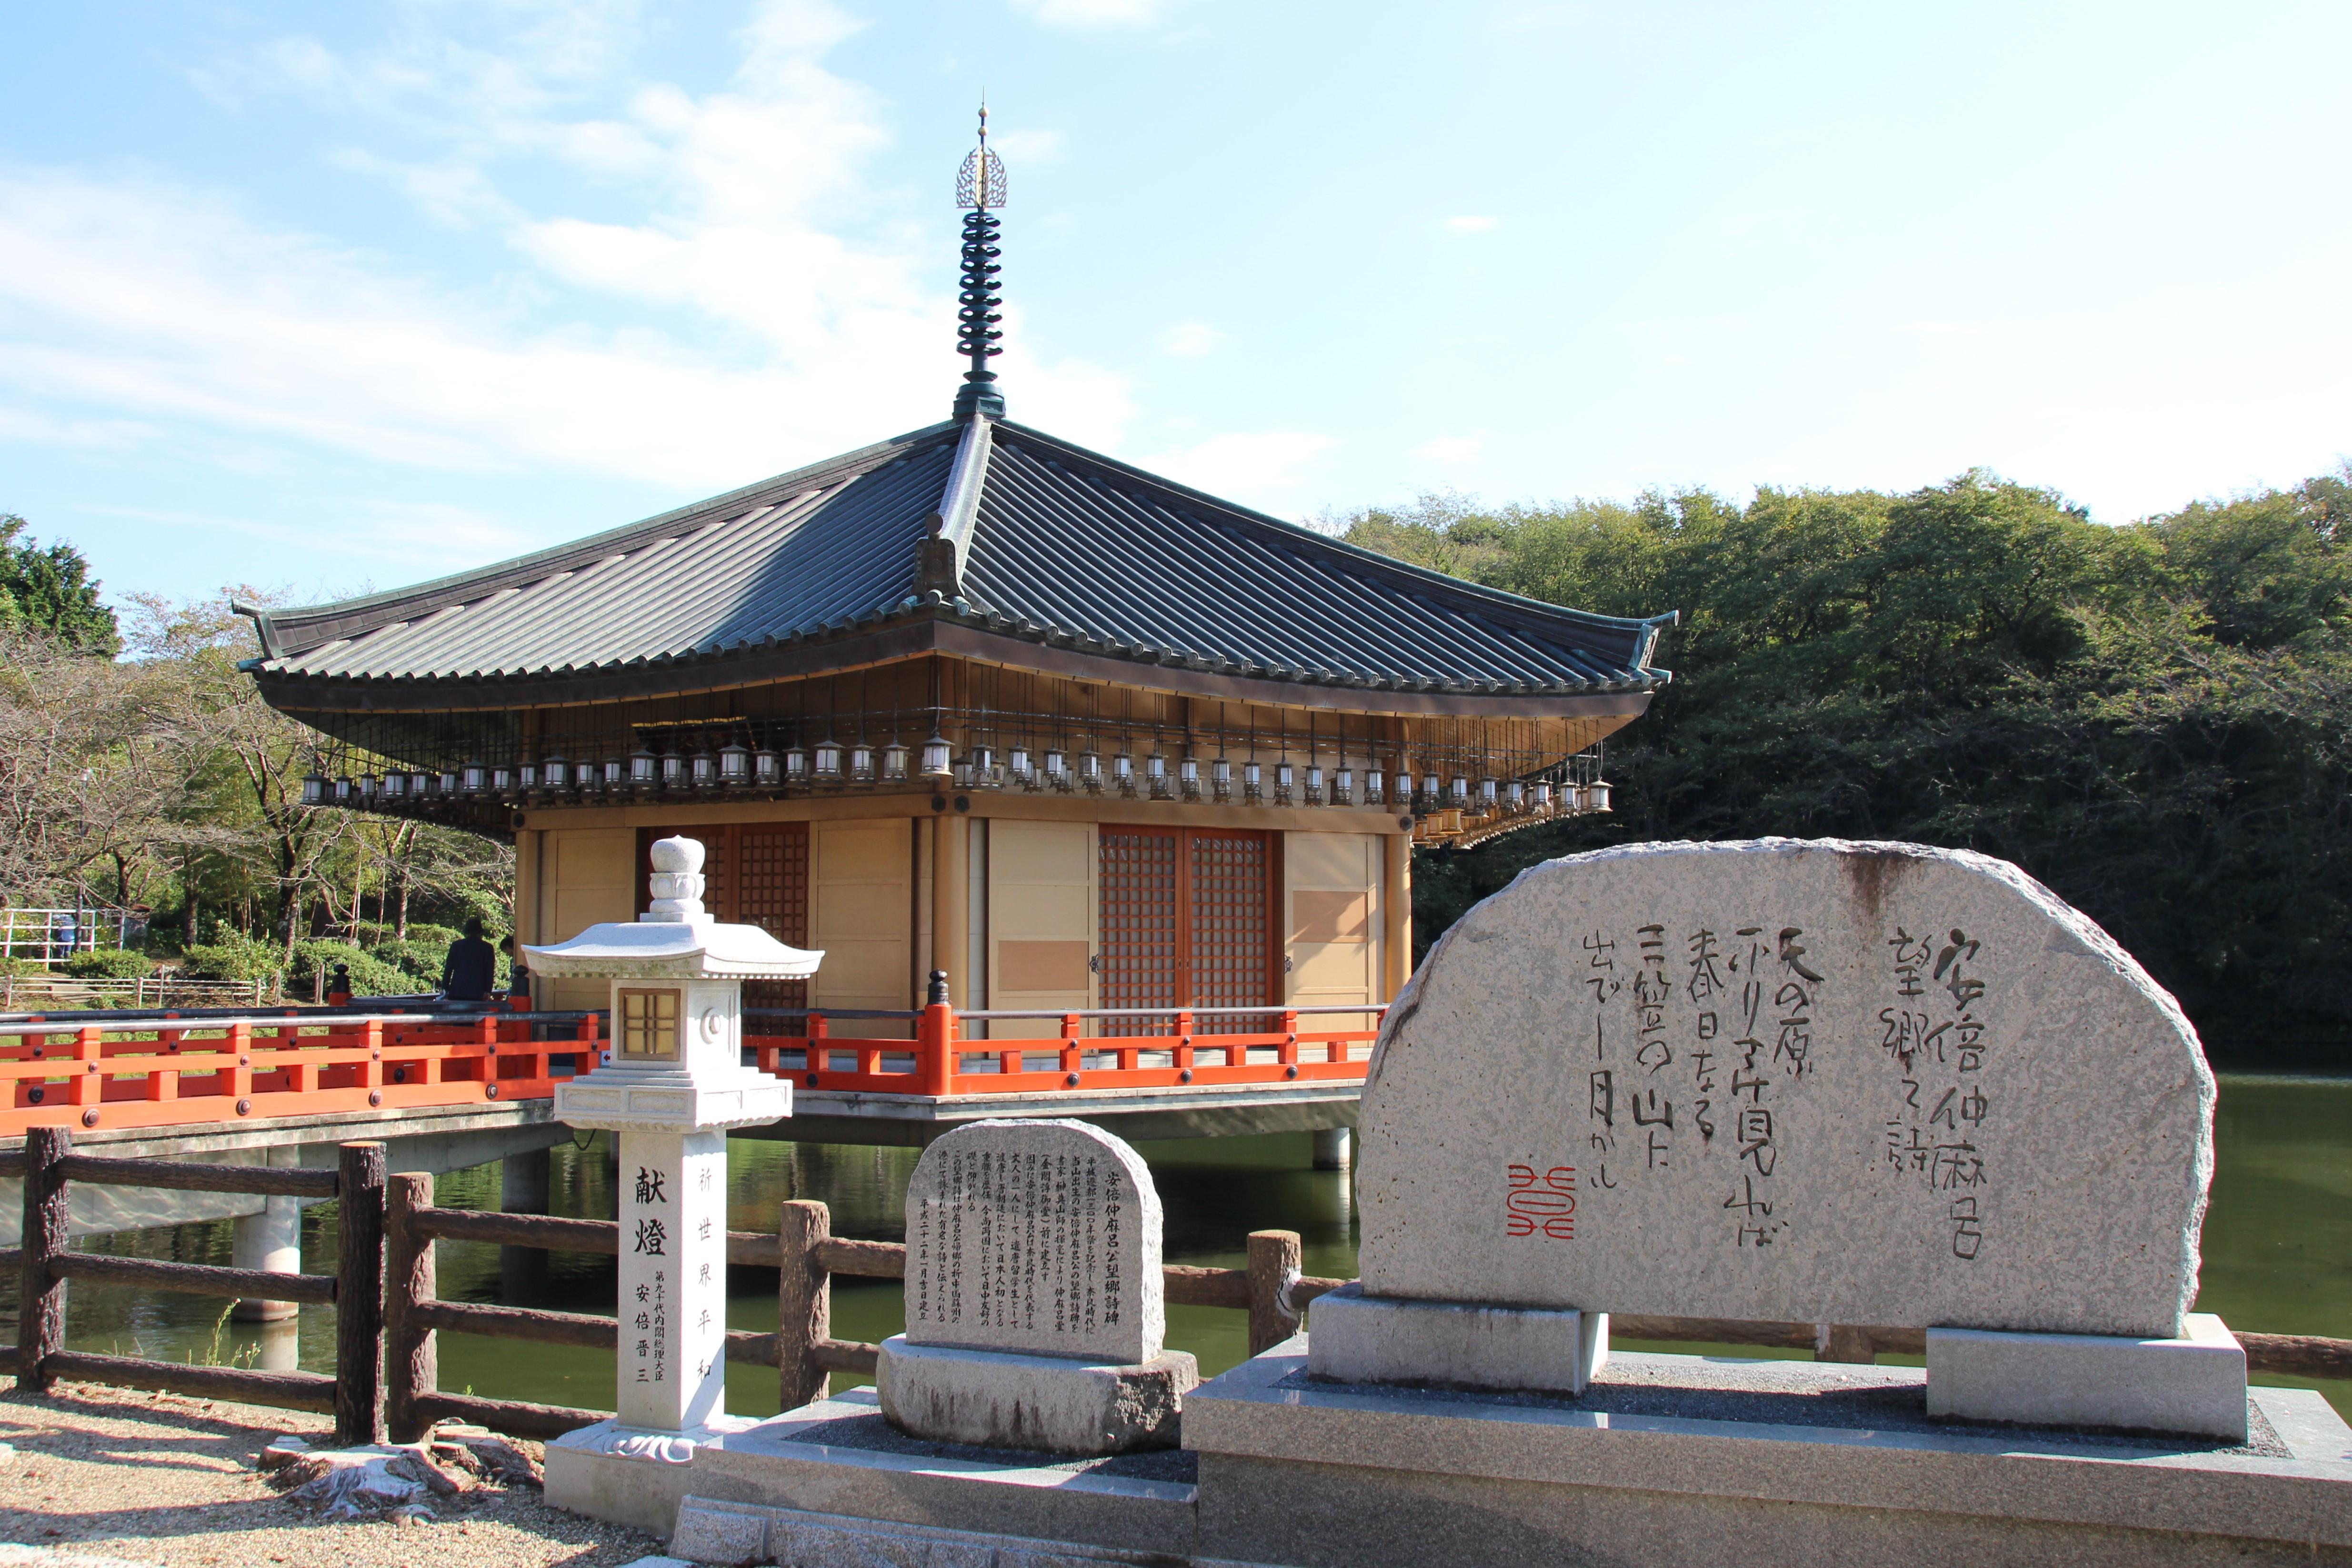 安倍文殊院(奈良)快慶作の渡海文殊菩薩像は必見!【御朱印】